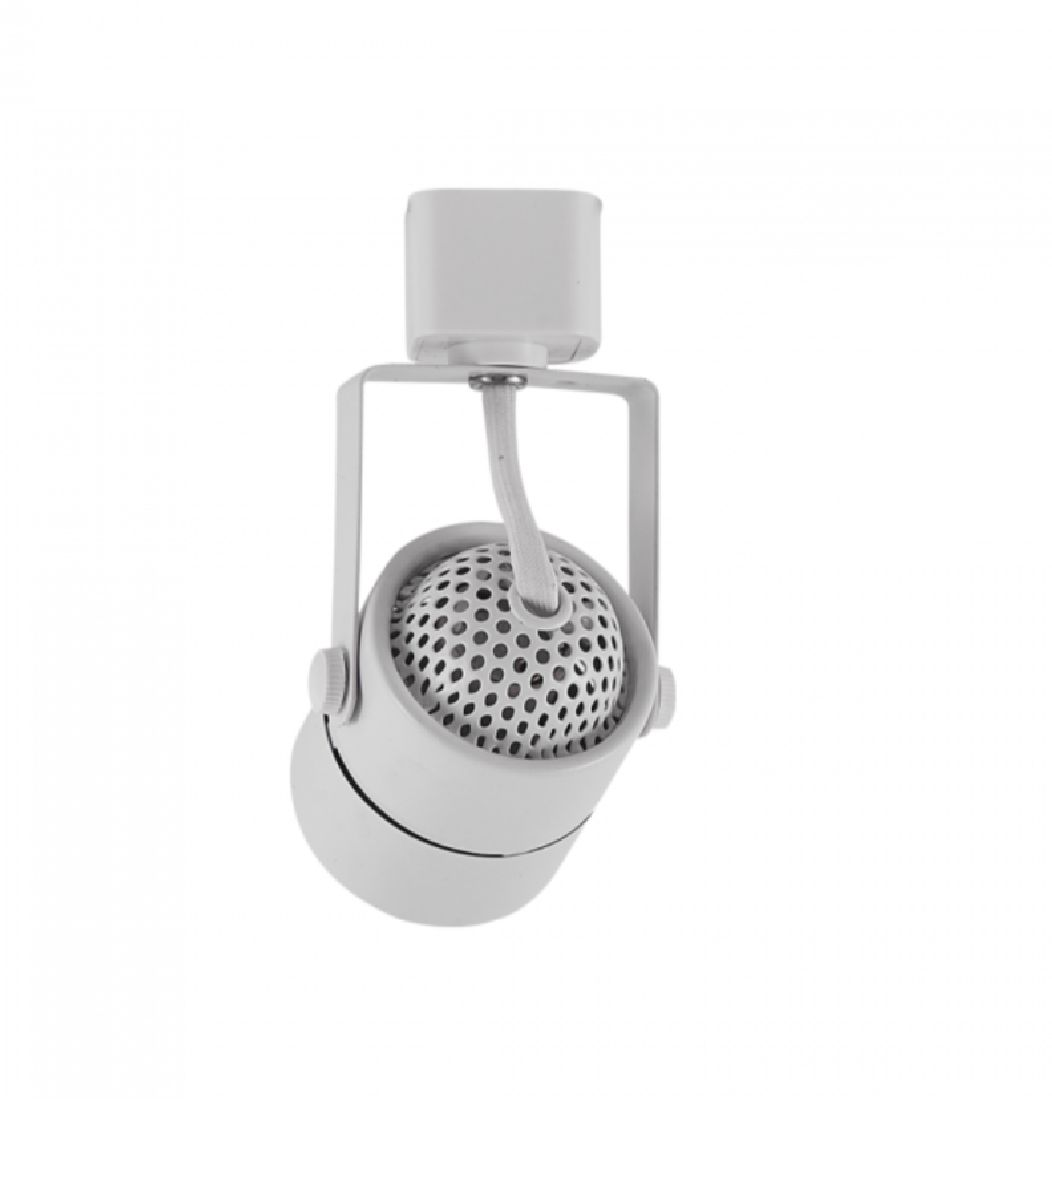 Kit Trilho Eletrificado 1,5m Branco Nordecor + 4 Spot Redondo MR16 / GU10 + Lâmp. Led Luz Quente